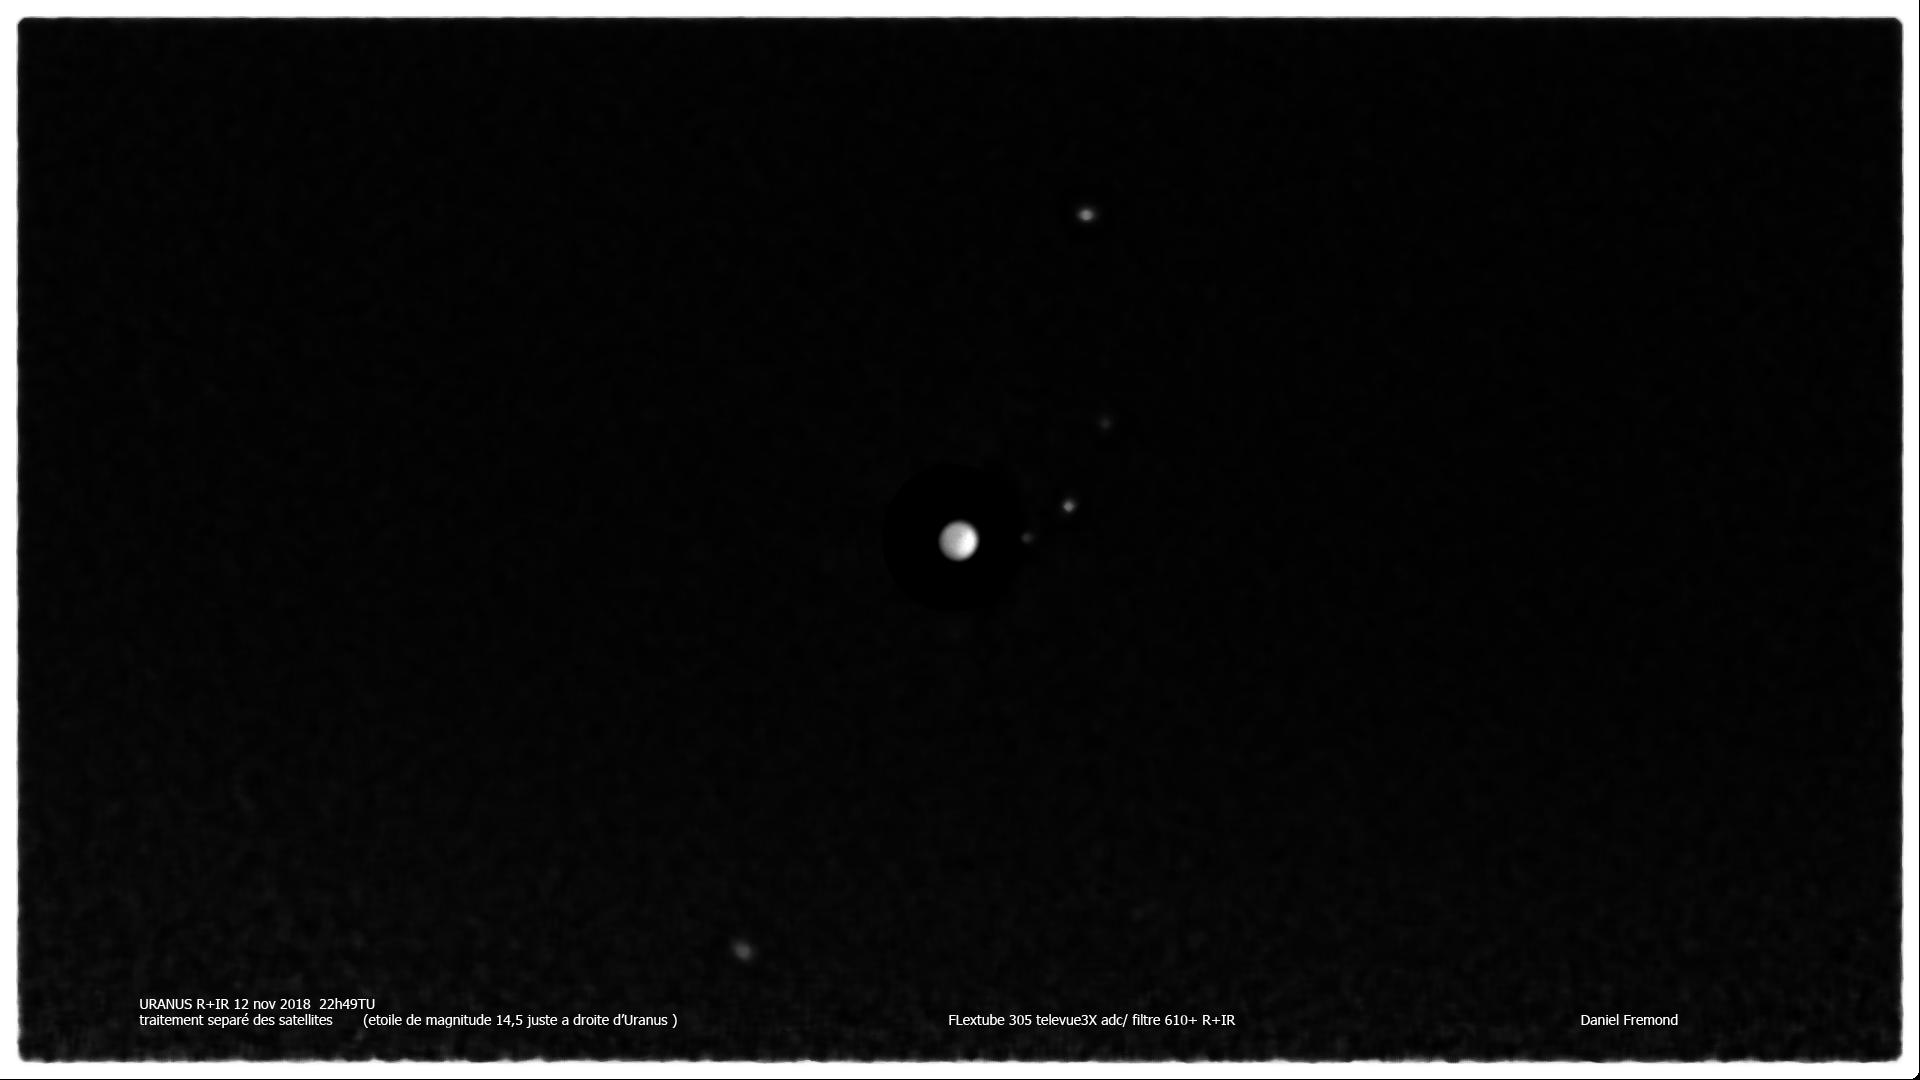 Uranus12-11-2018-22h49TUcompo.png.5b8c6b59f6171df462b604ea566223e8.png